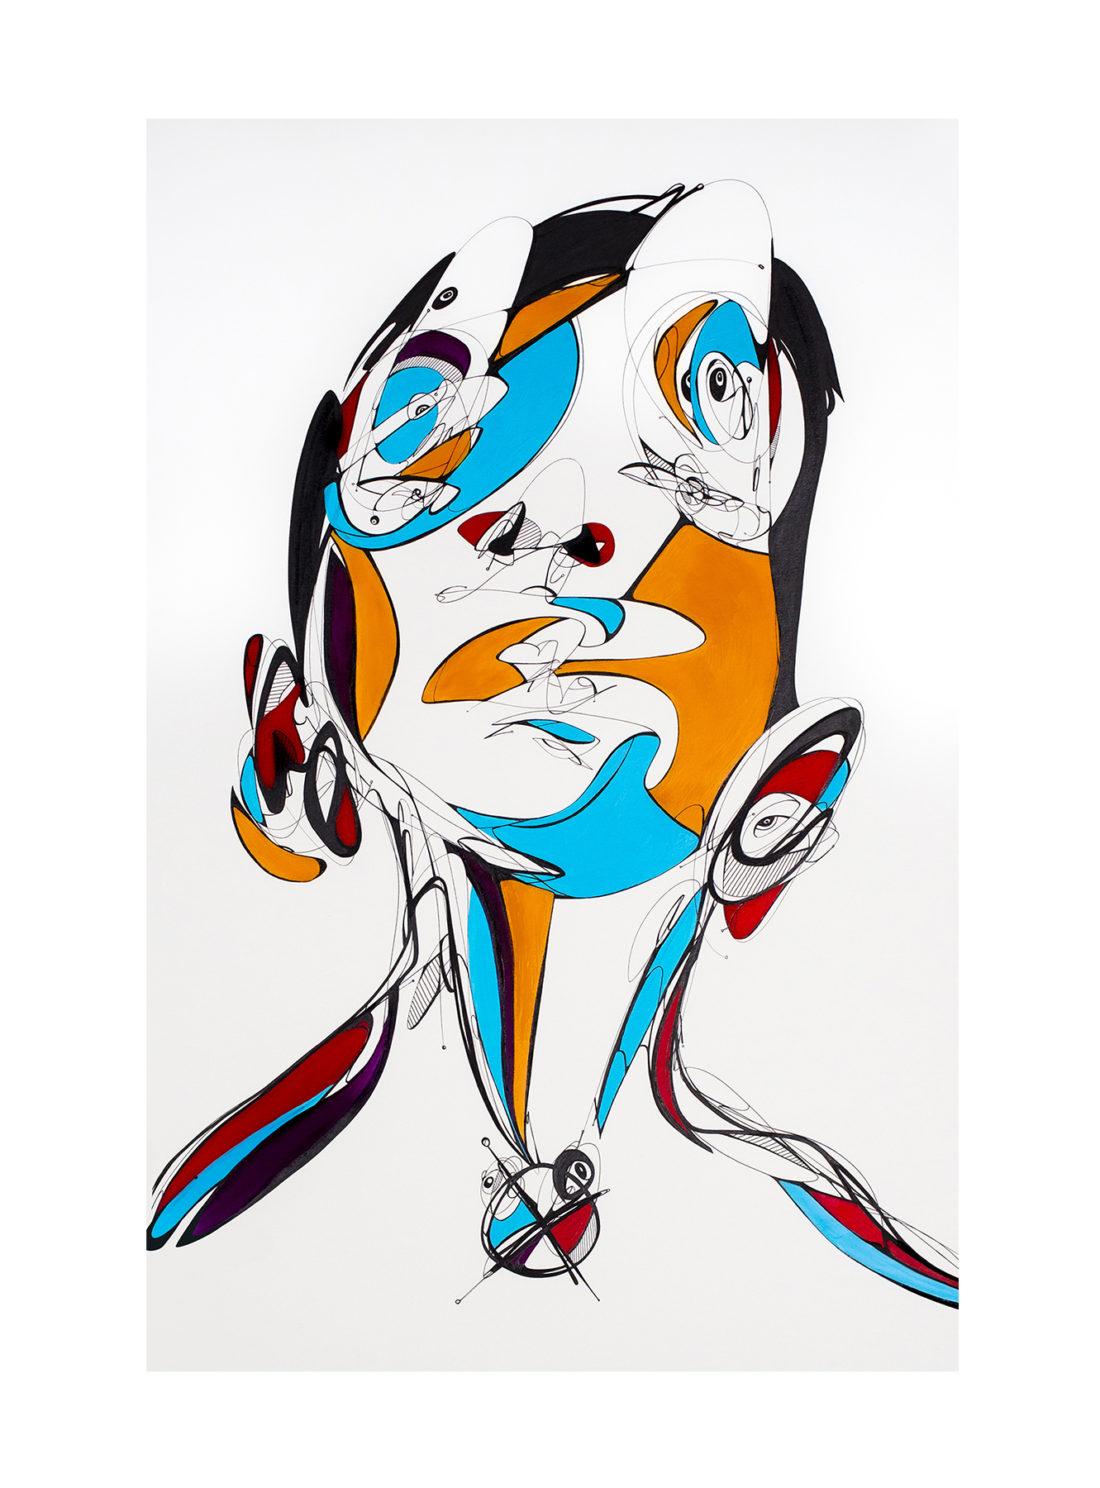 Untitled #95 (Stateless) - Martin Kalanda